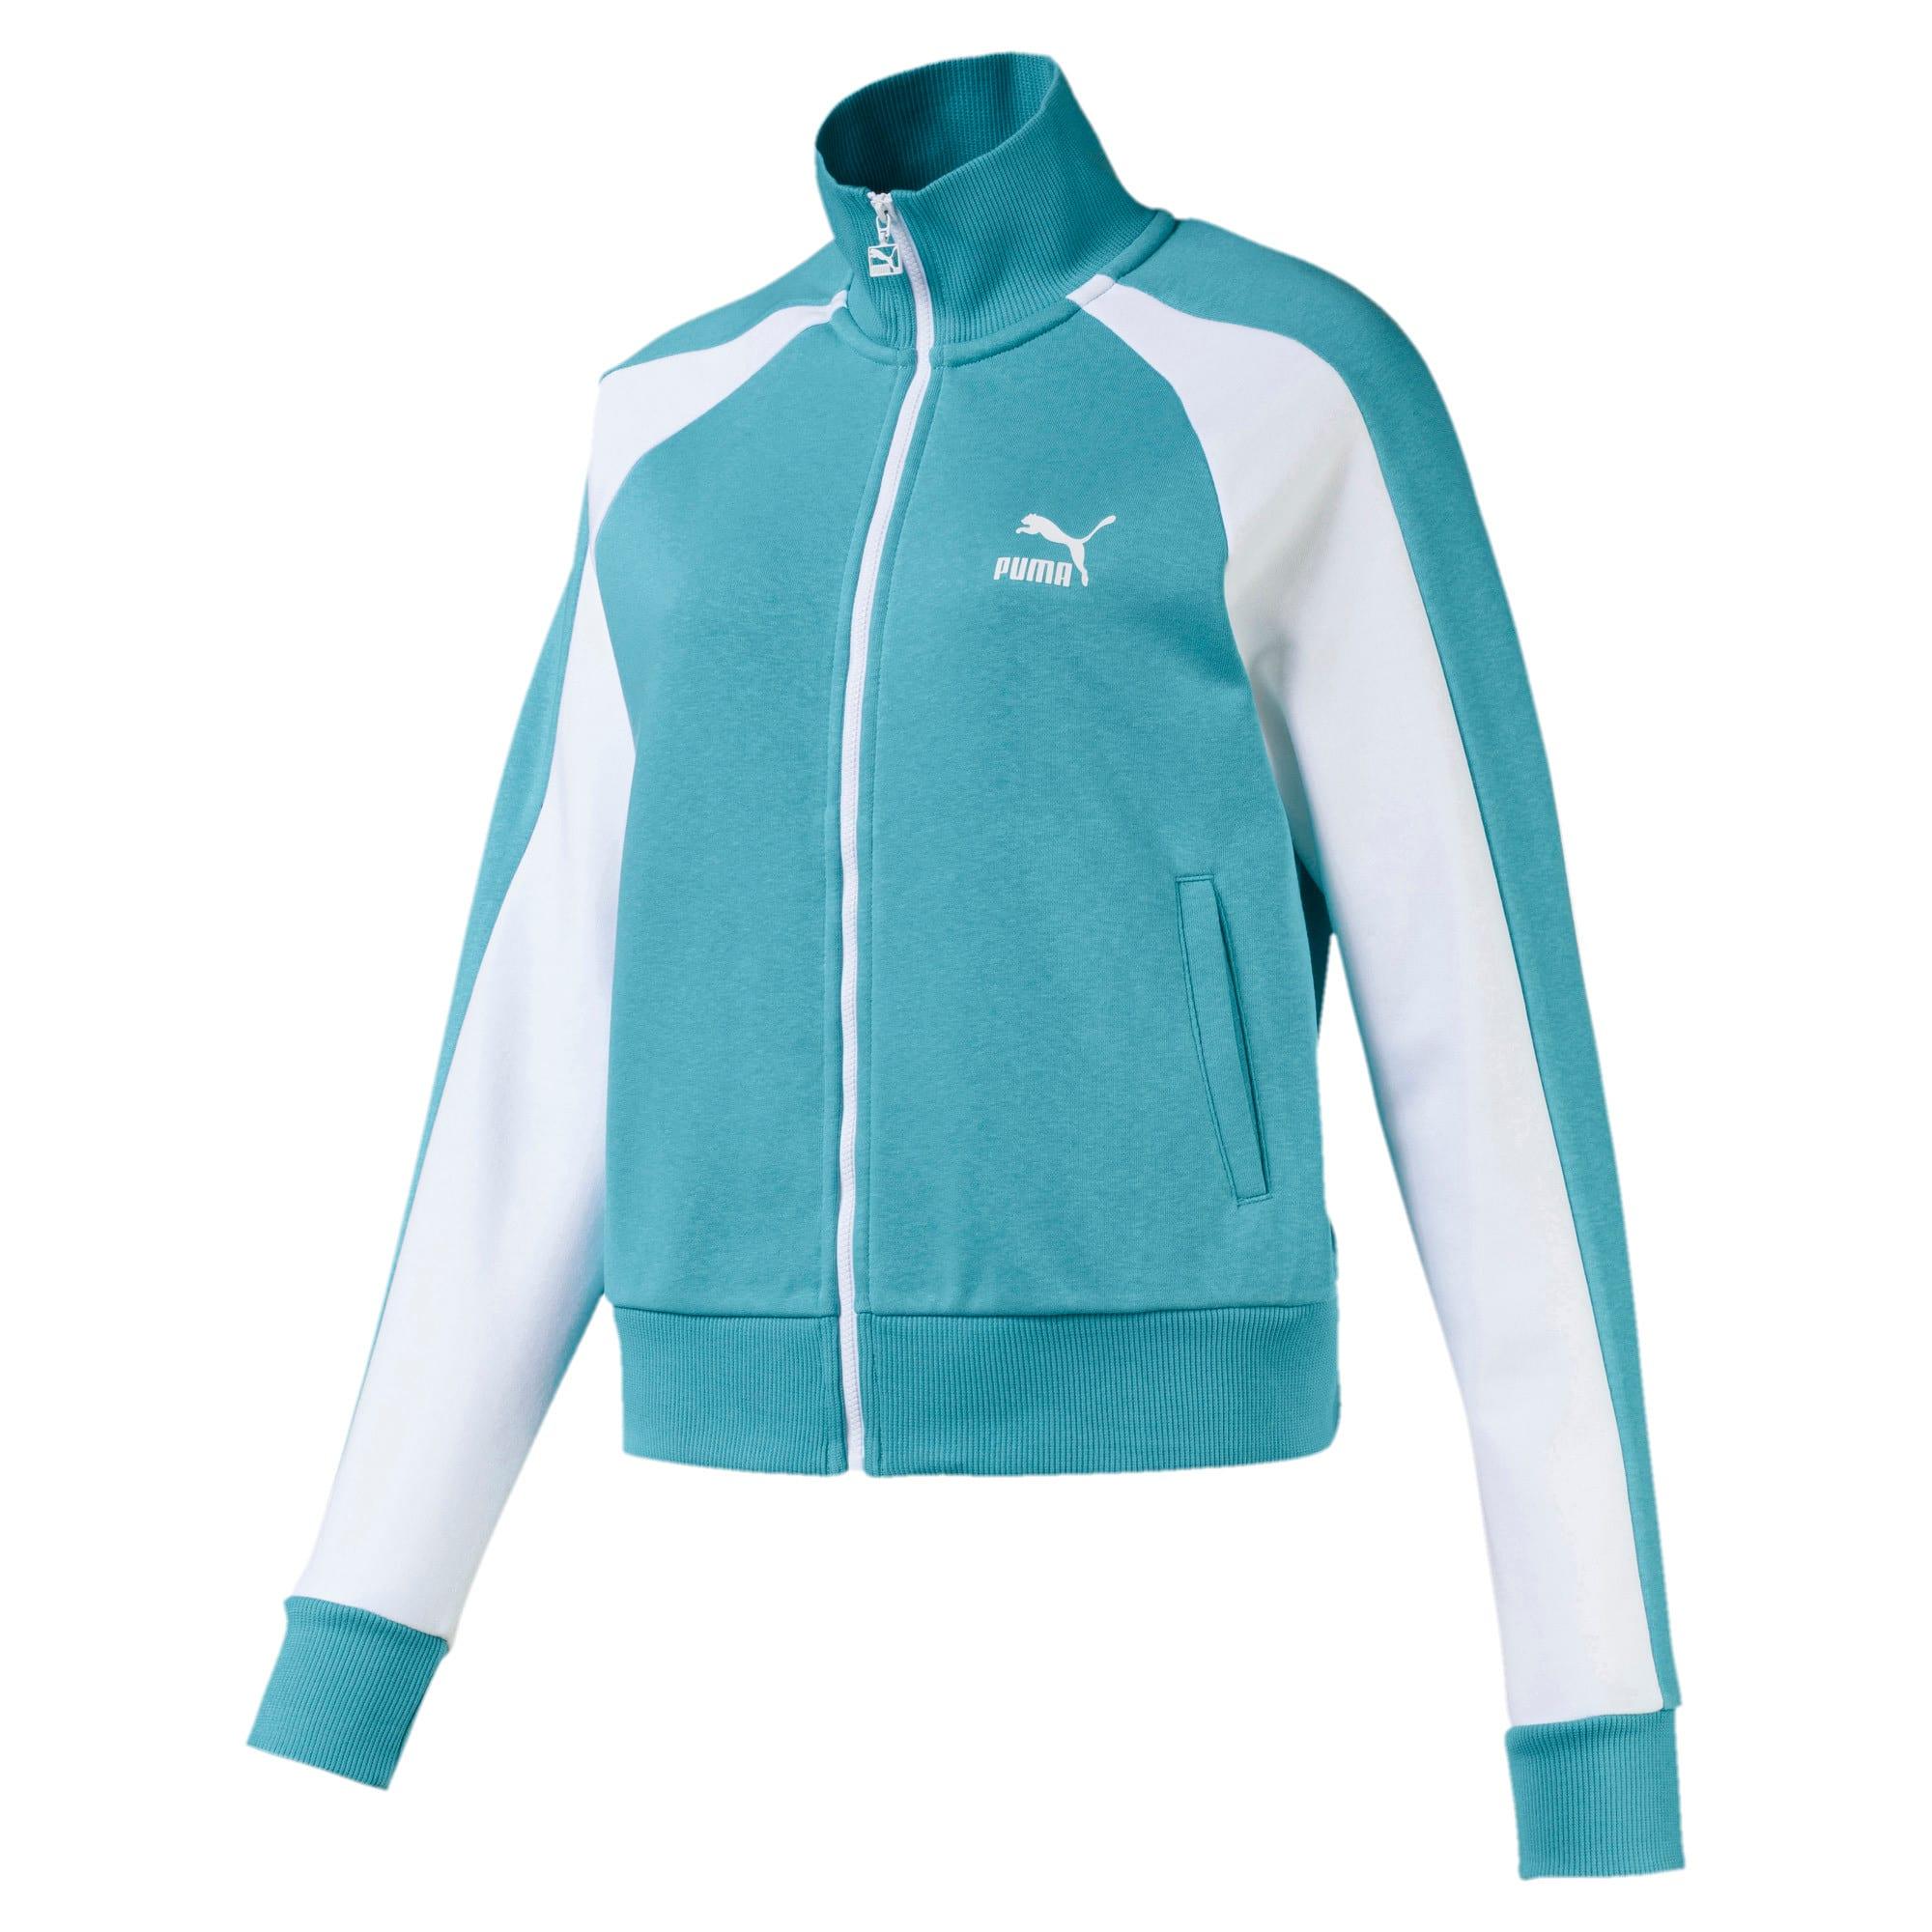 Thumbnail 1 of Classics T7 Women's Track Jacket, Milky Blue, medium